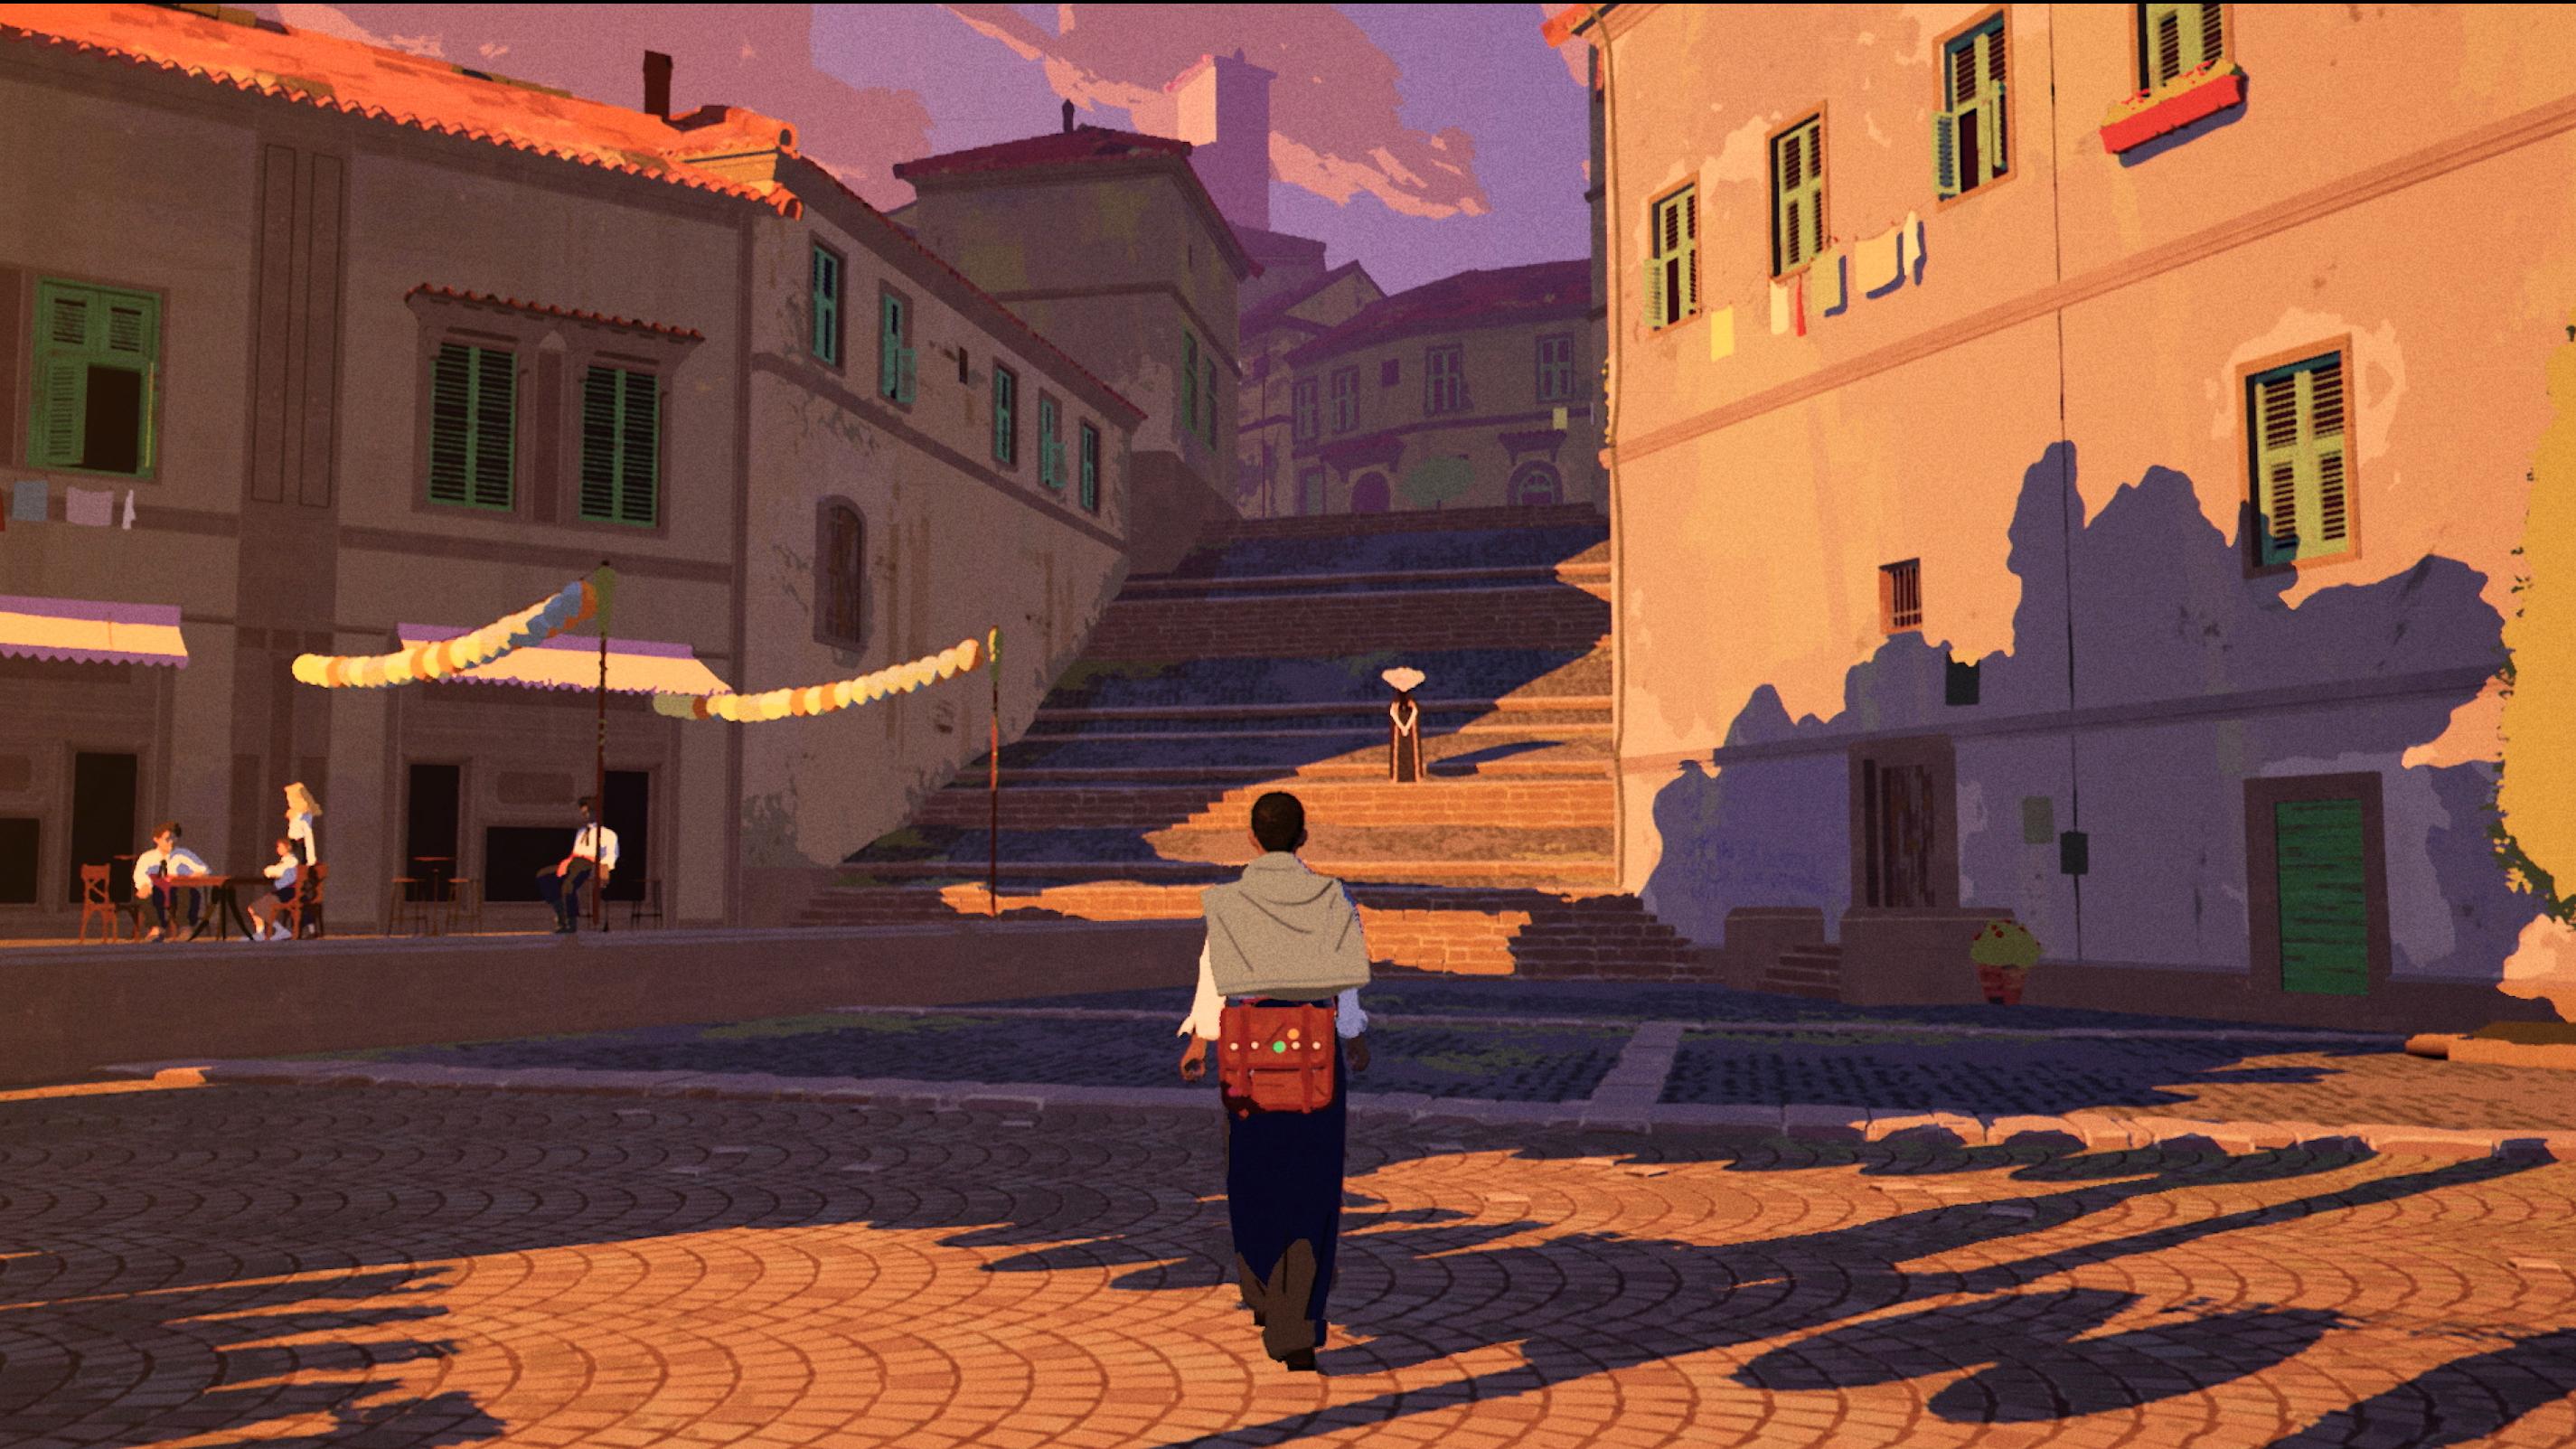 A boy walking through a town square in the game Season